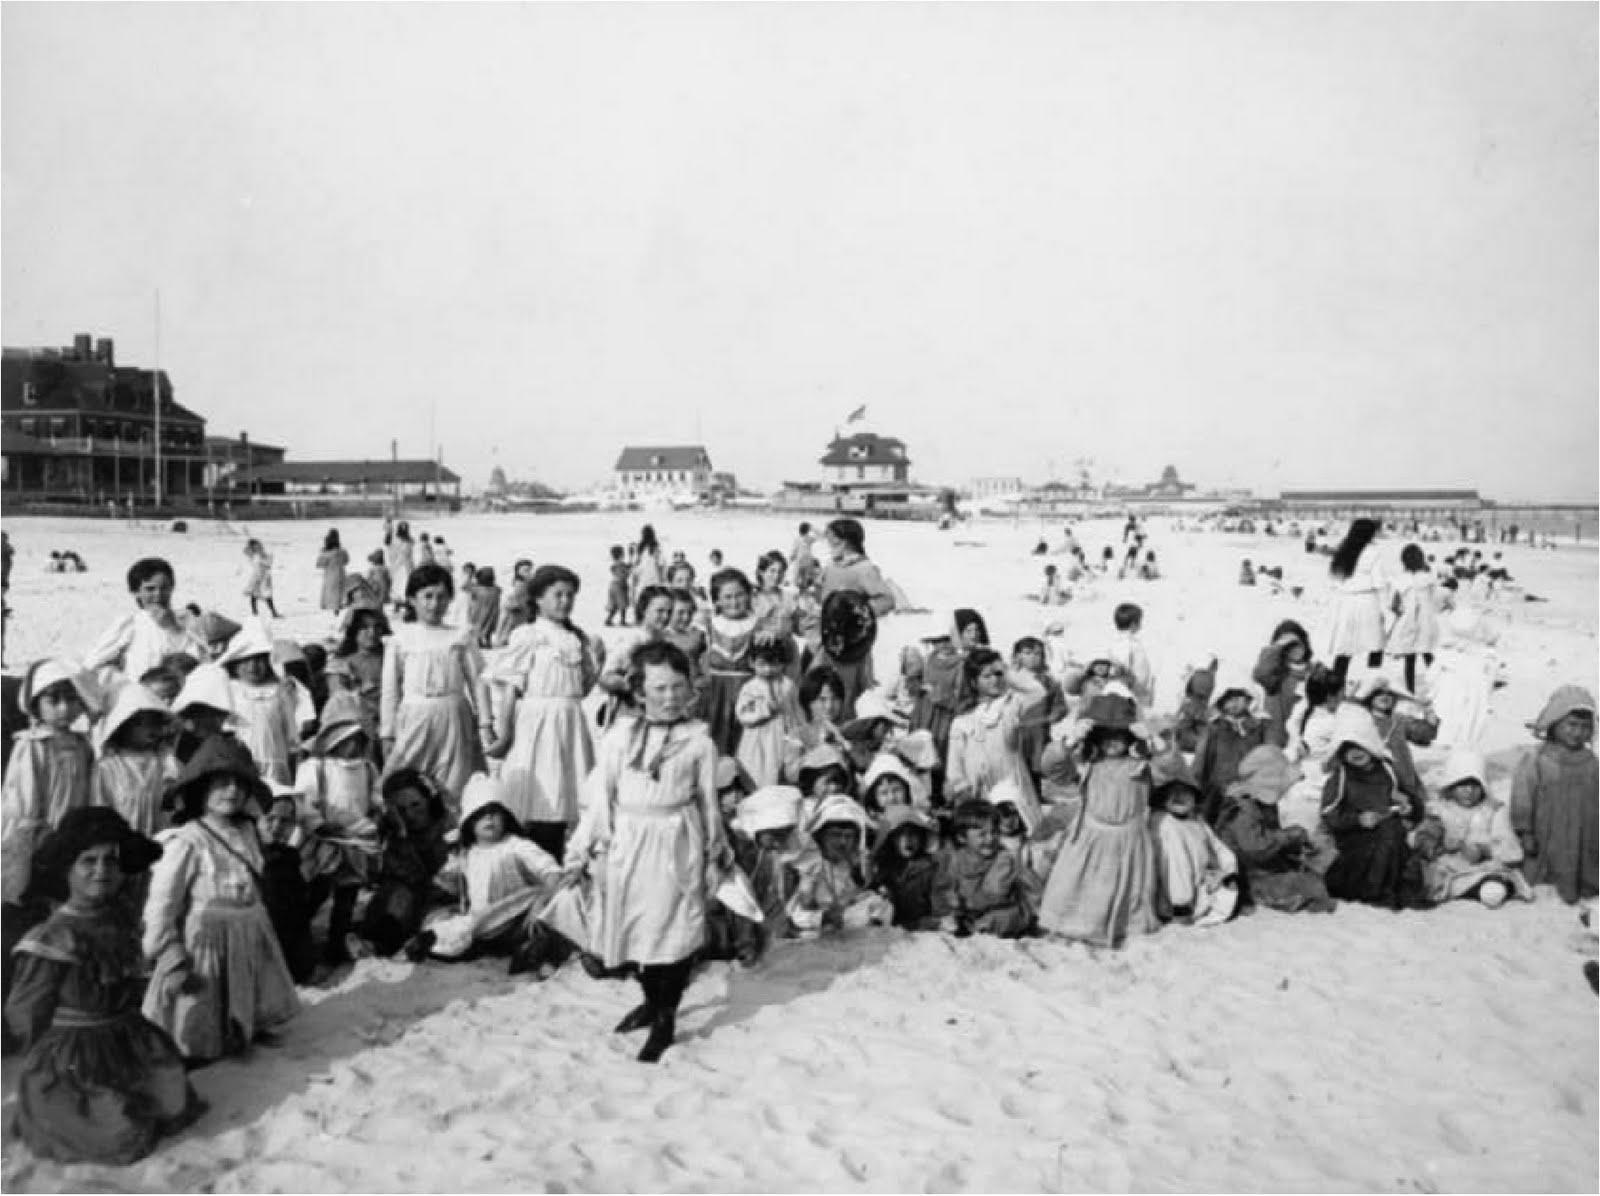 Vintage beach images